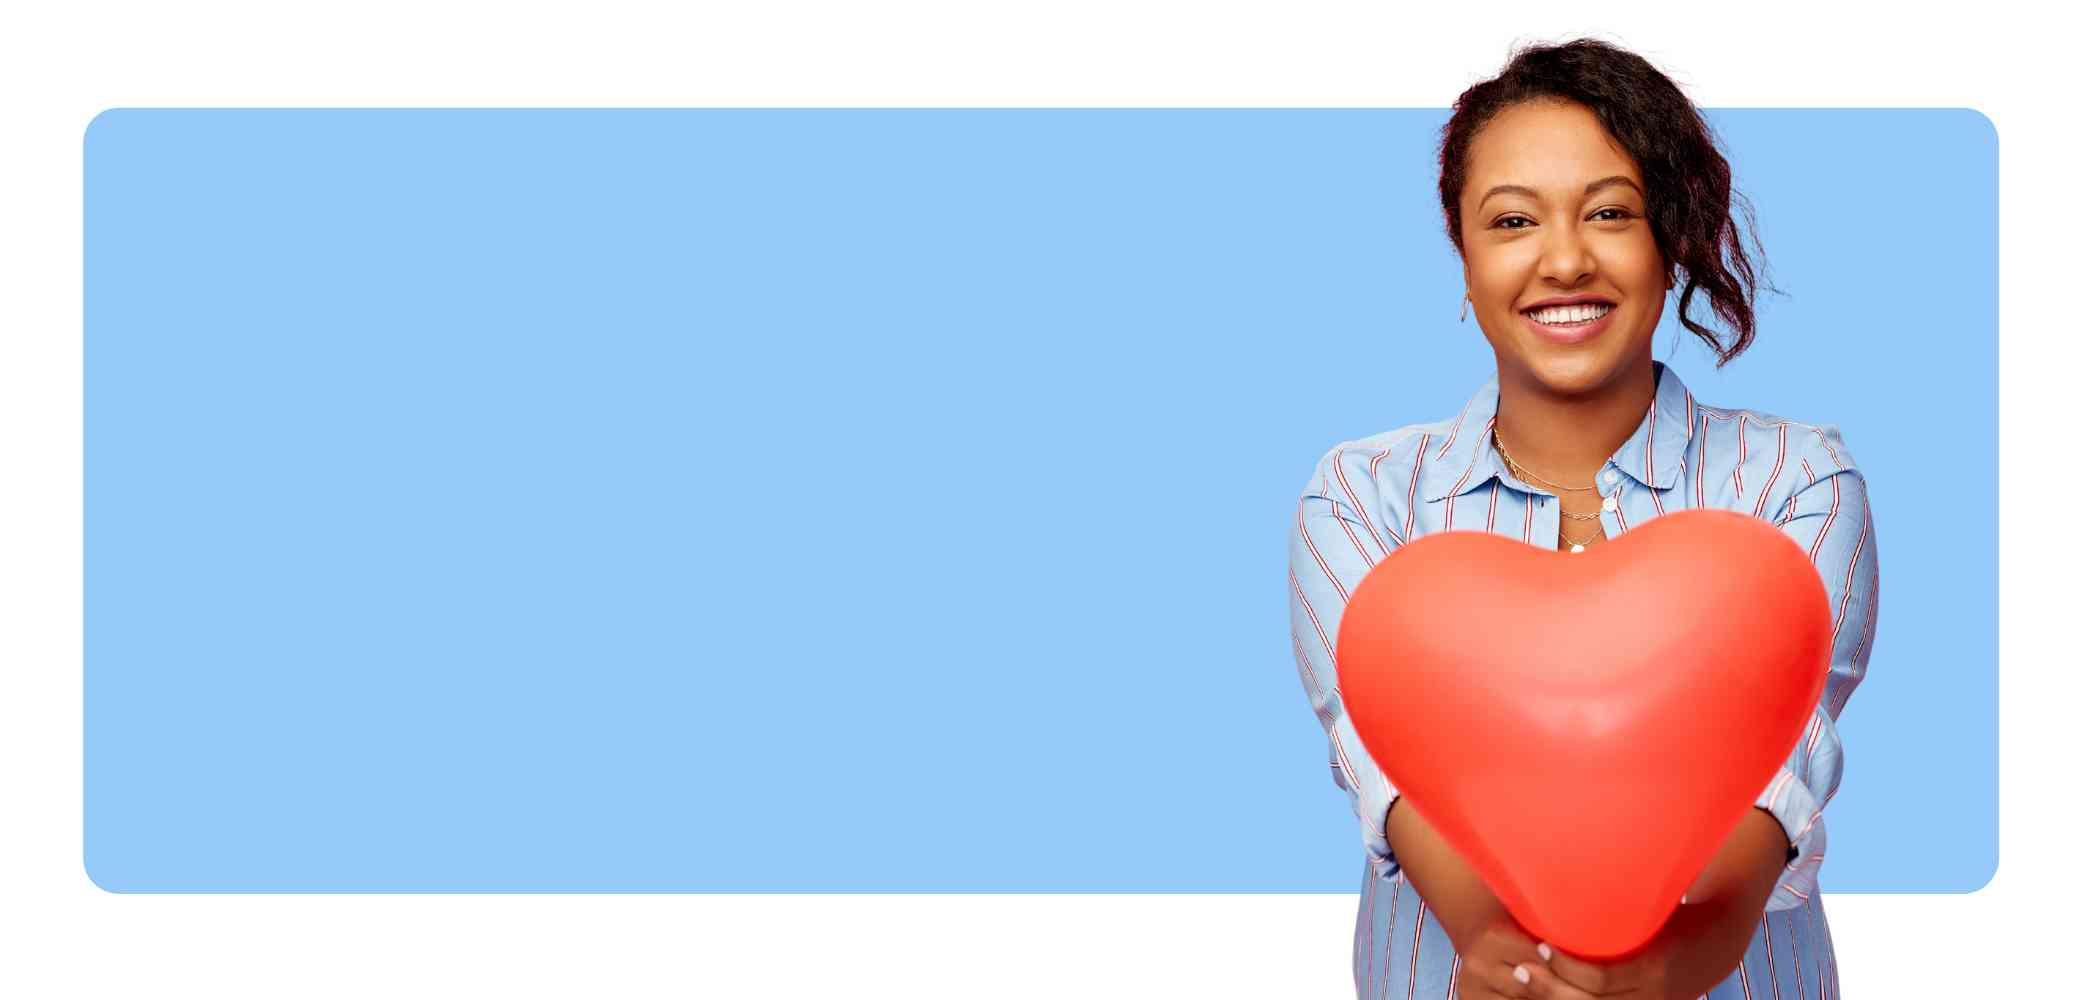 girl holding heart balloon